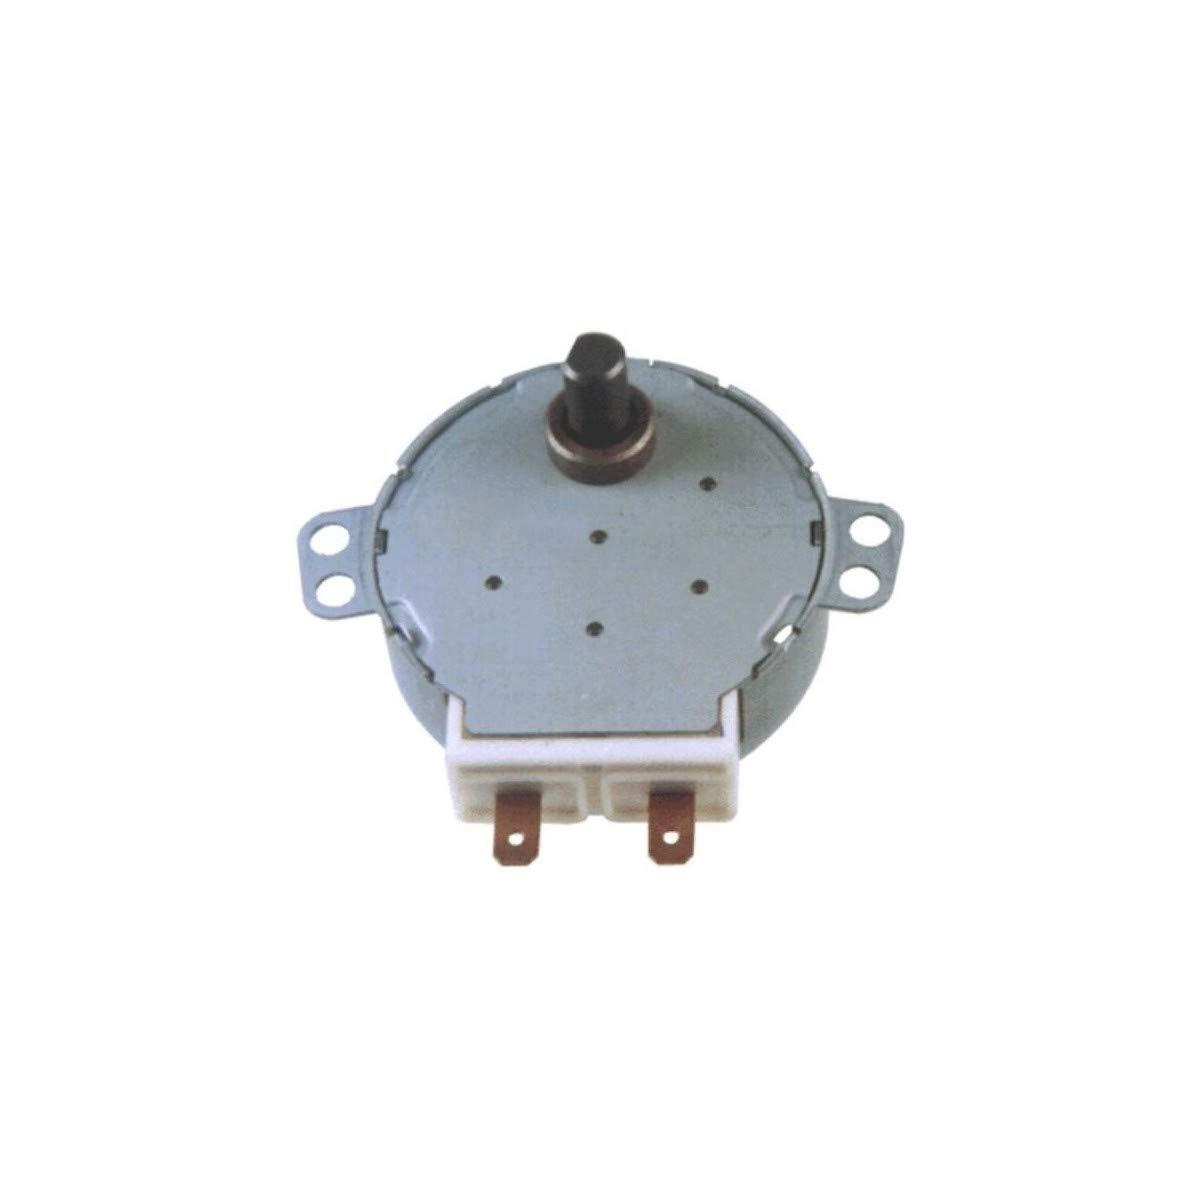 Recamania Motor giraplato microondas Standard Eje 14 mm 5/6 RPM 1 ...